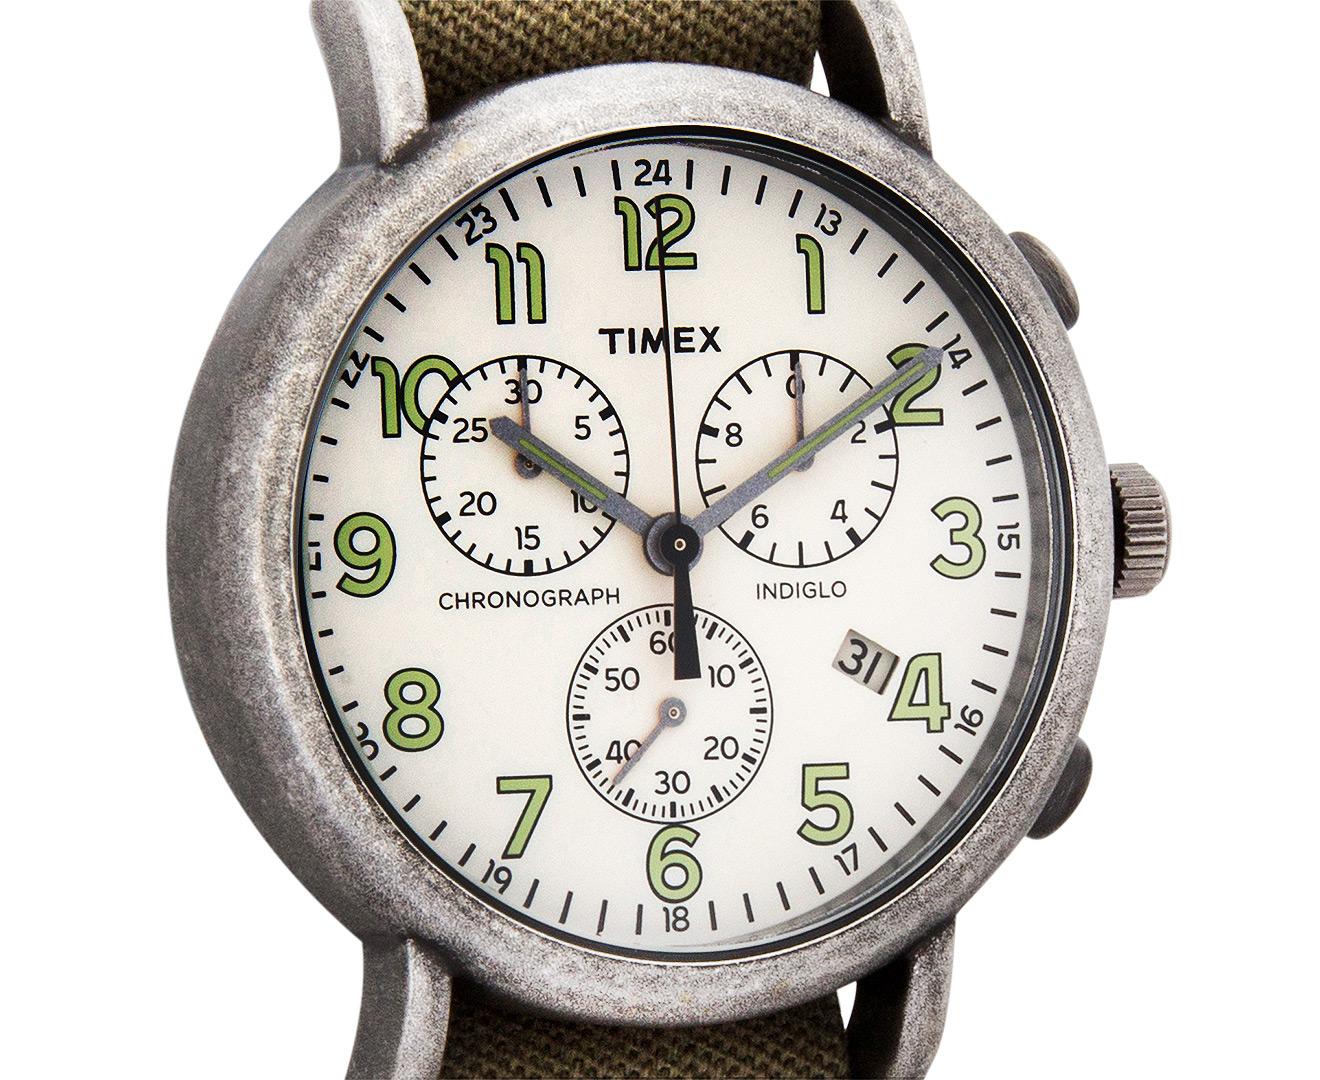 Timex 40mm Weekender Vintage Chronograph Watch Olive